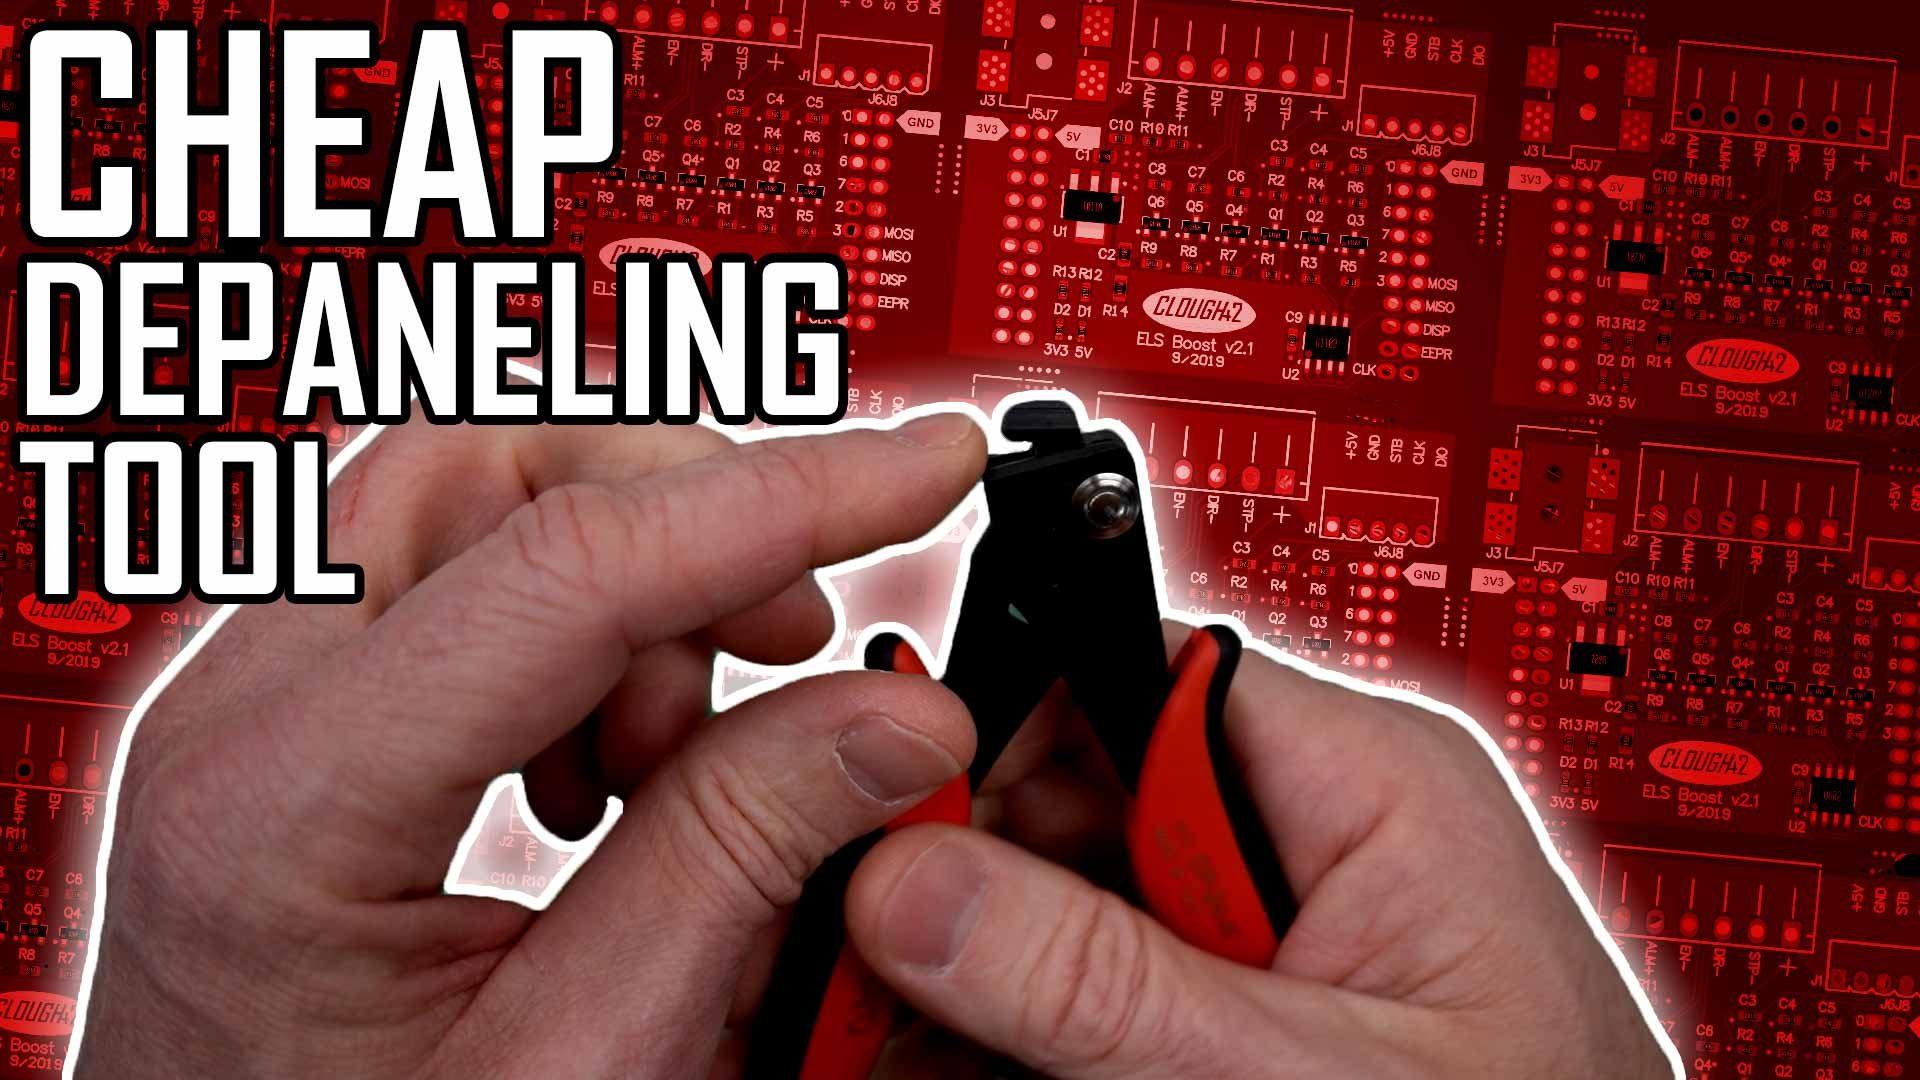 Panelizing PCBs Addendum: Hakko Depaneling Tool